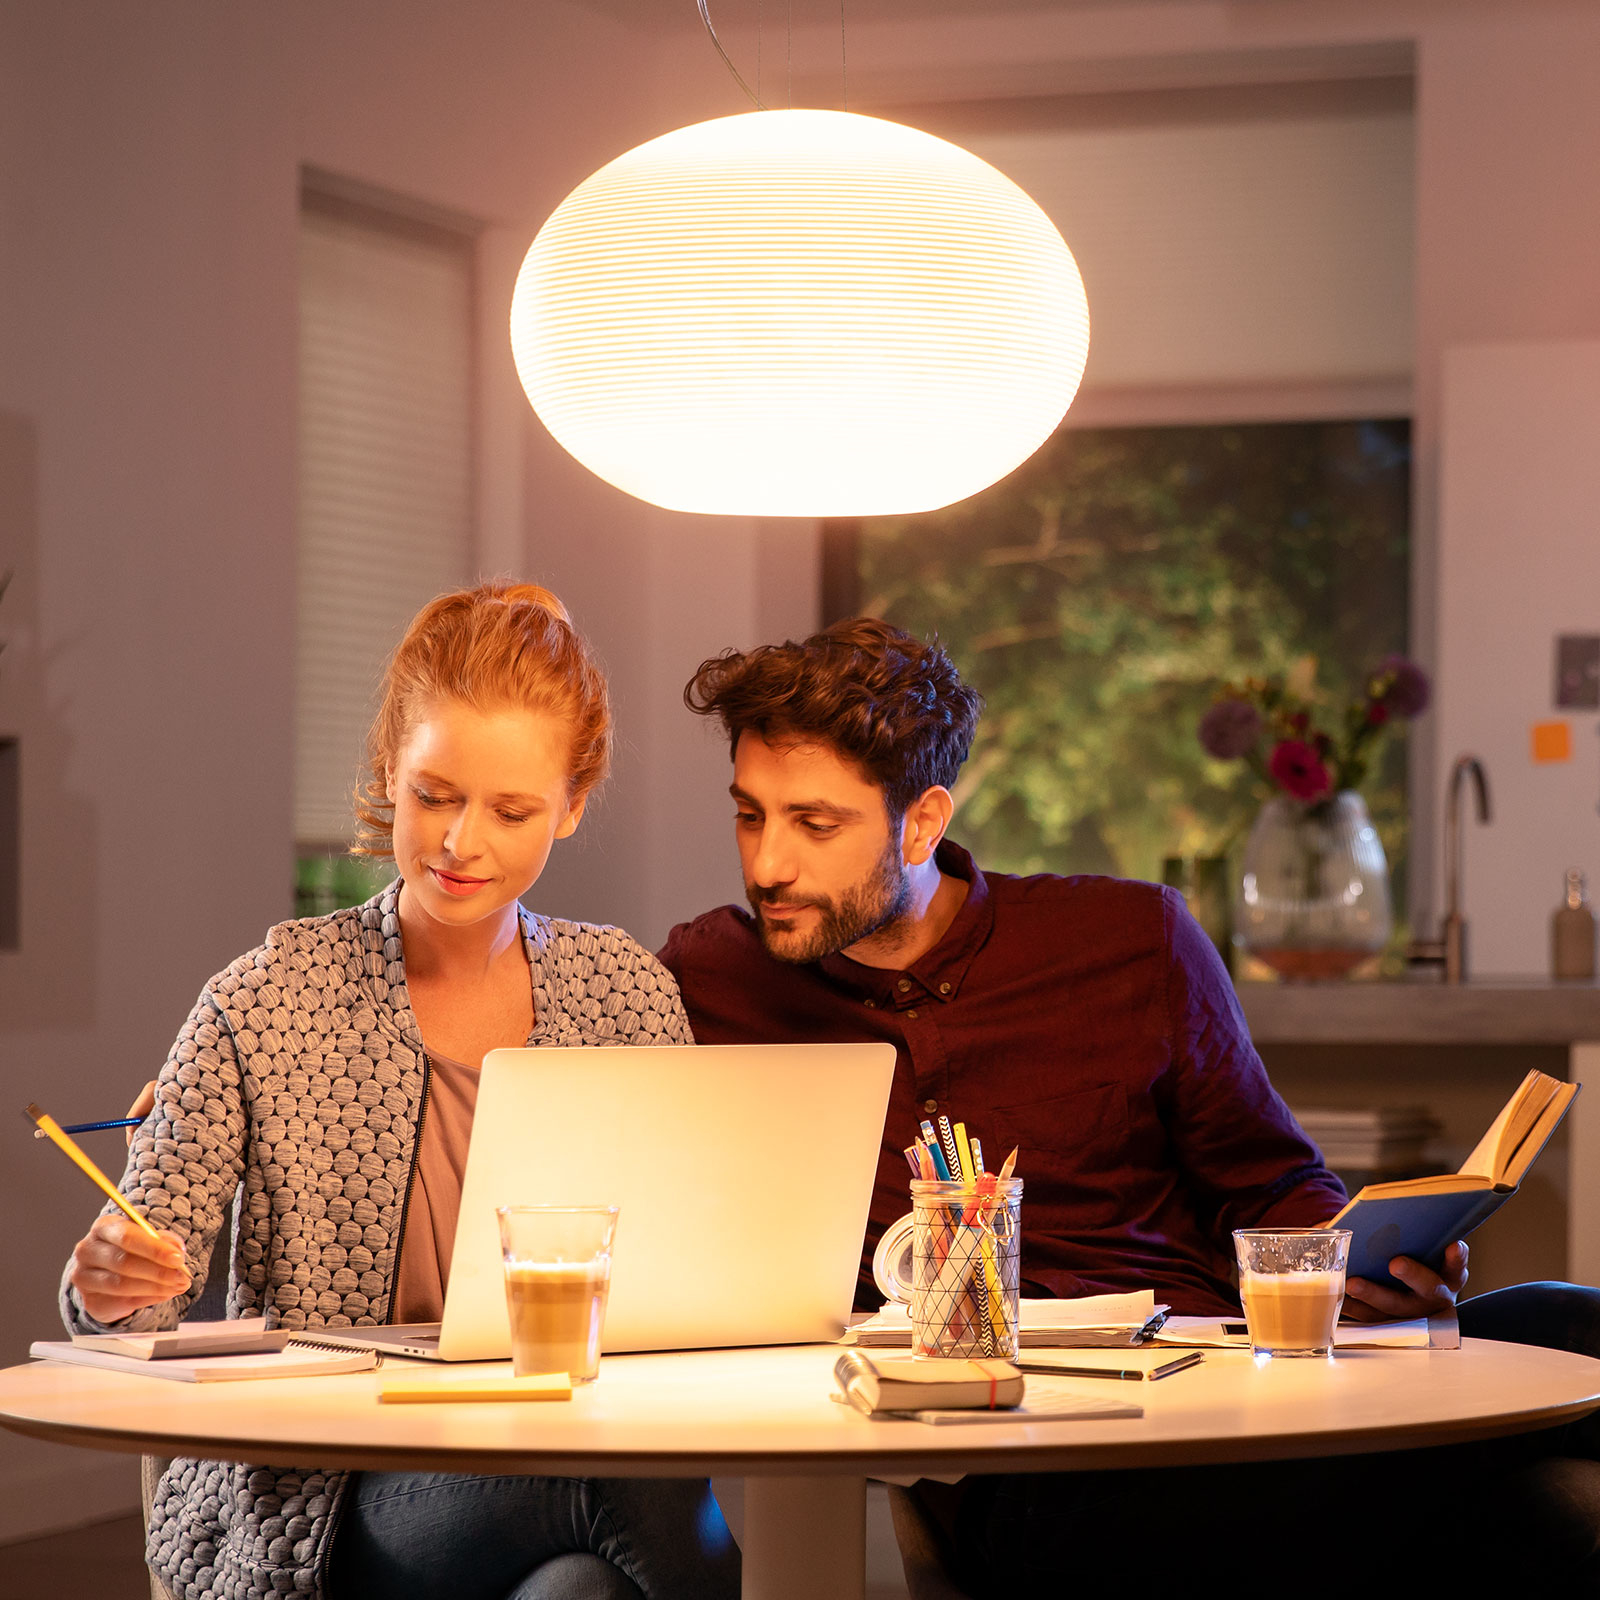 Philips Hue Flourish LED taklampe, RGBW | Lampegiganten.no